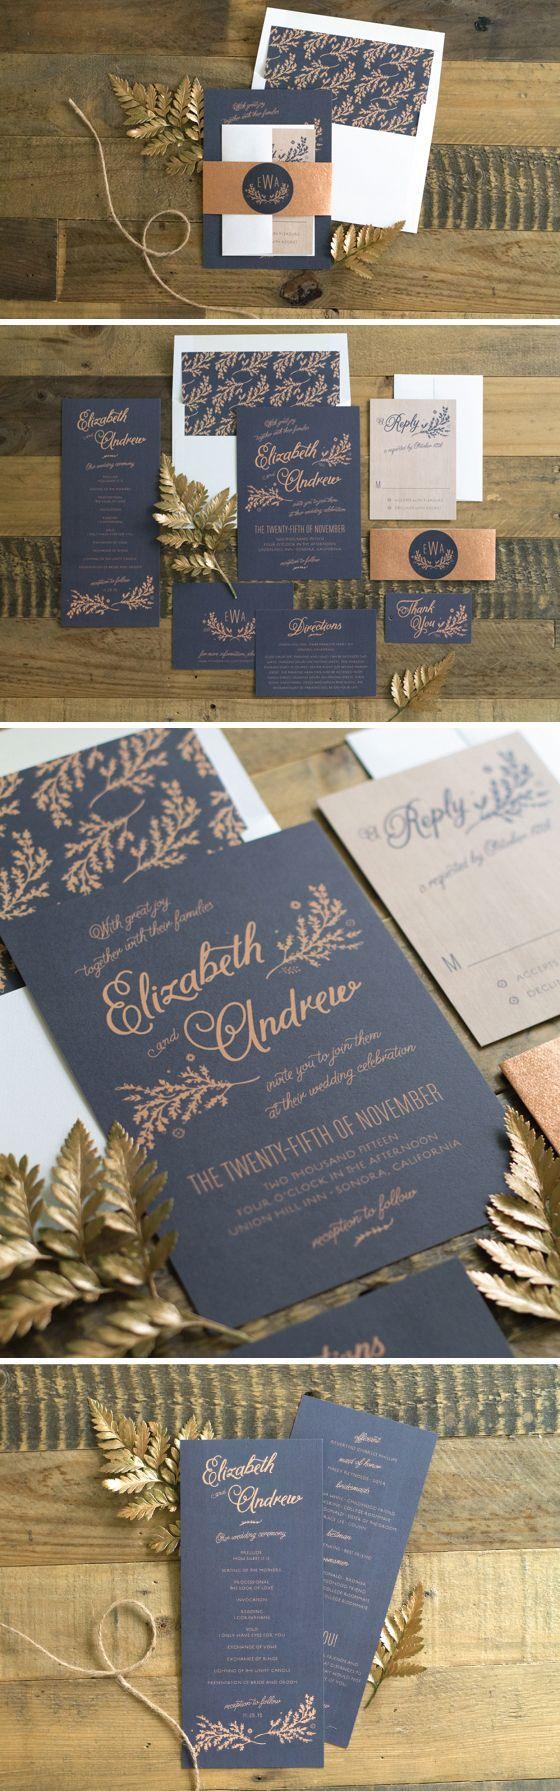 Rustic Wedding Invitations in Navy | Rustic wedding invitations ...